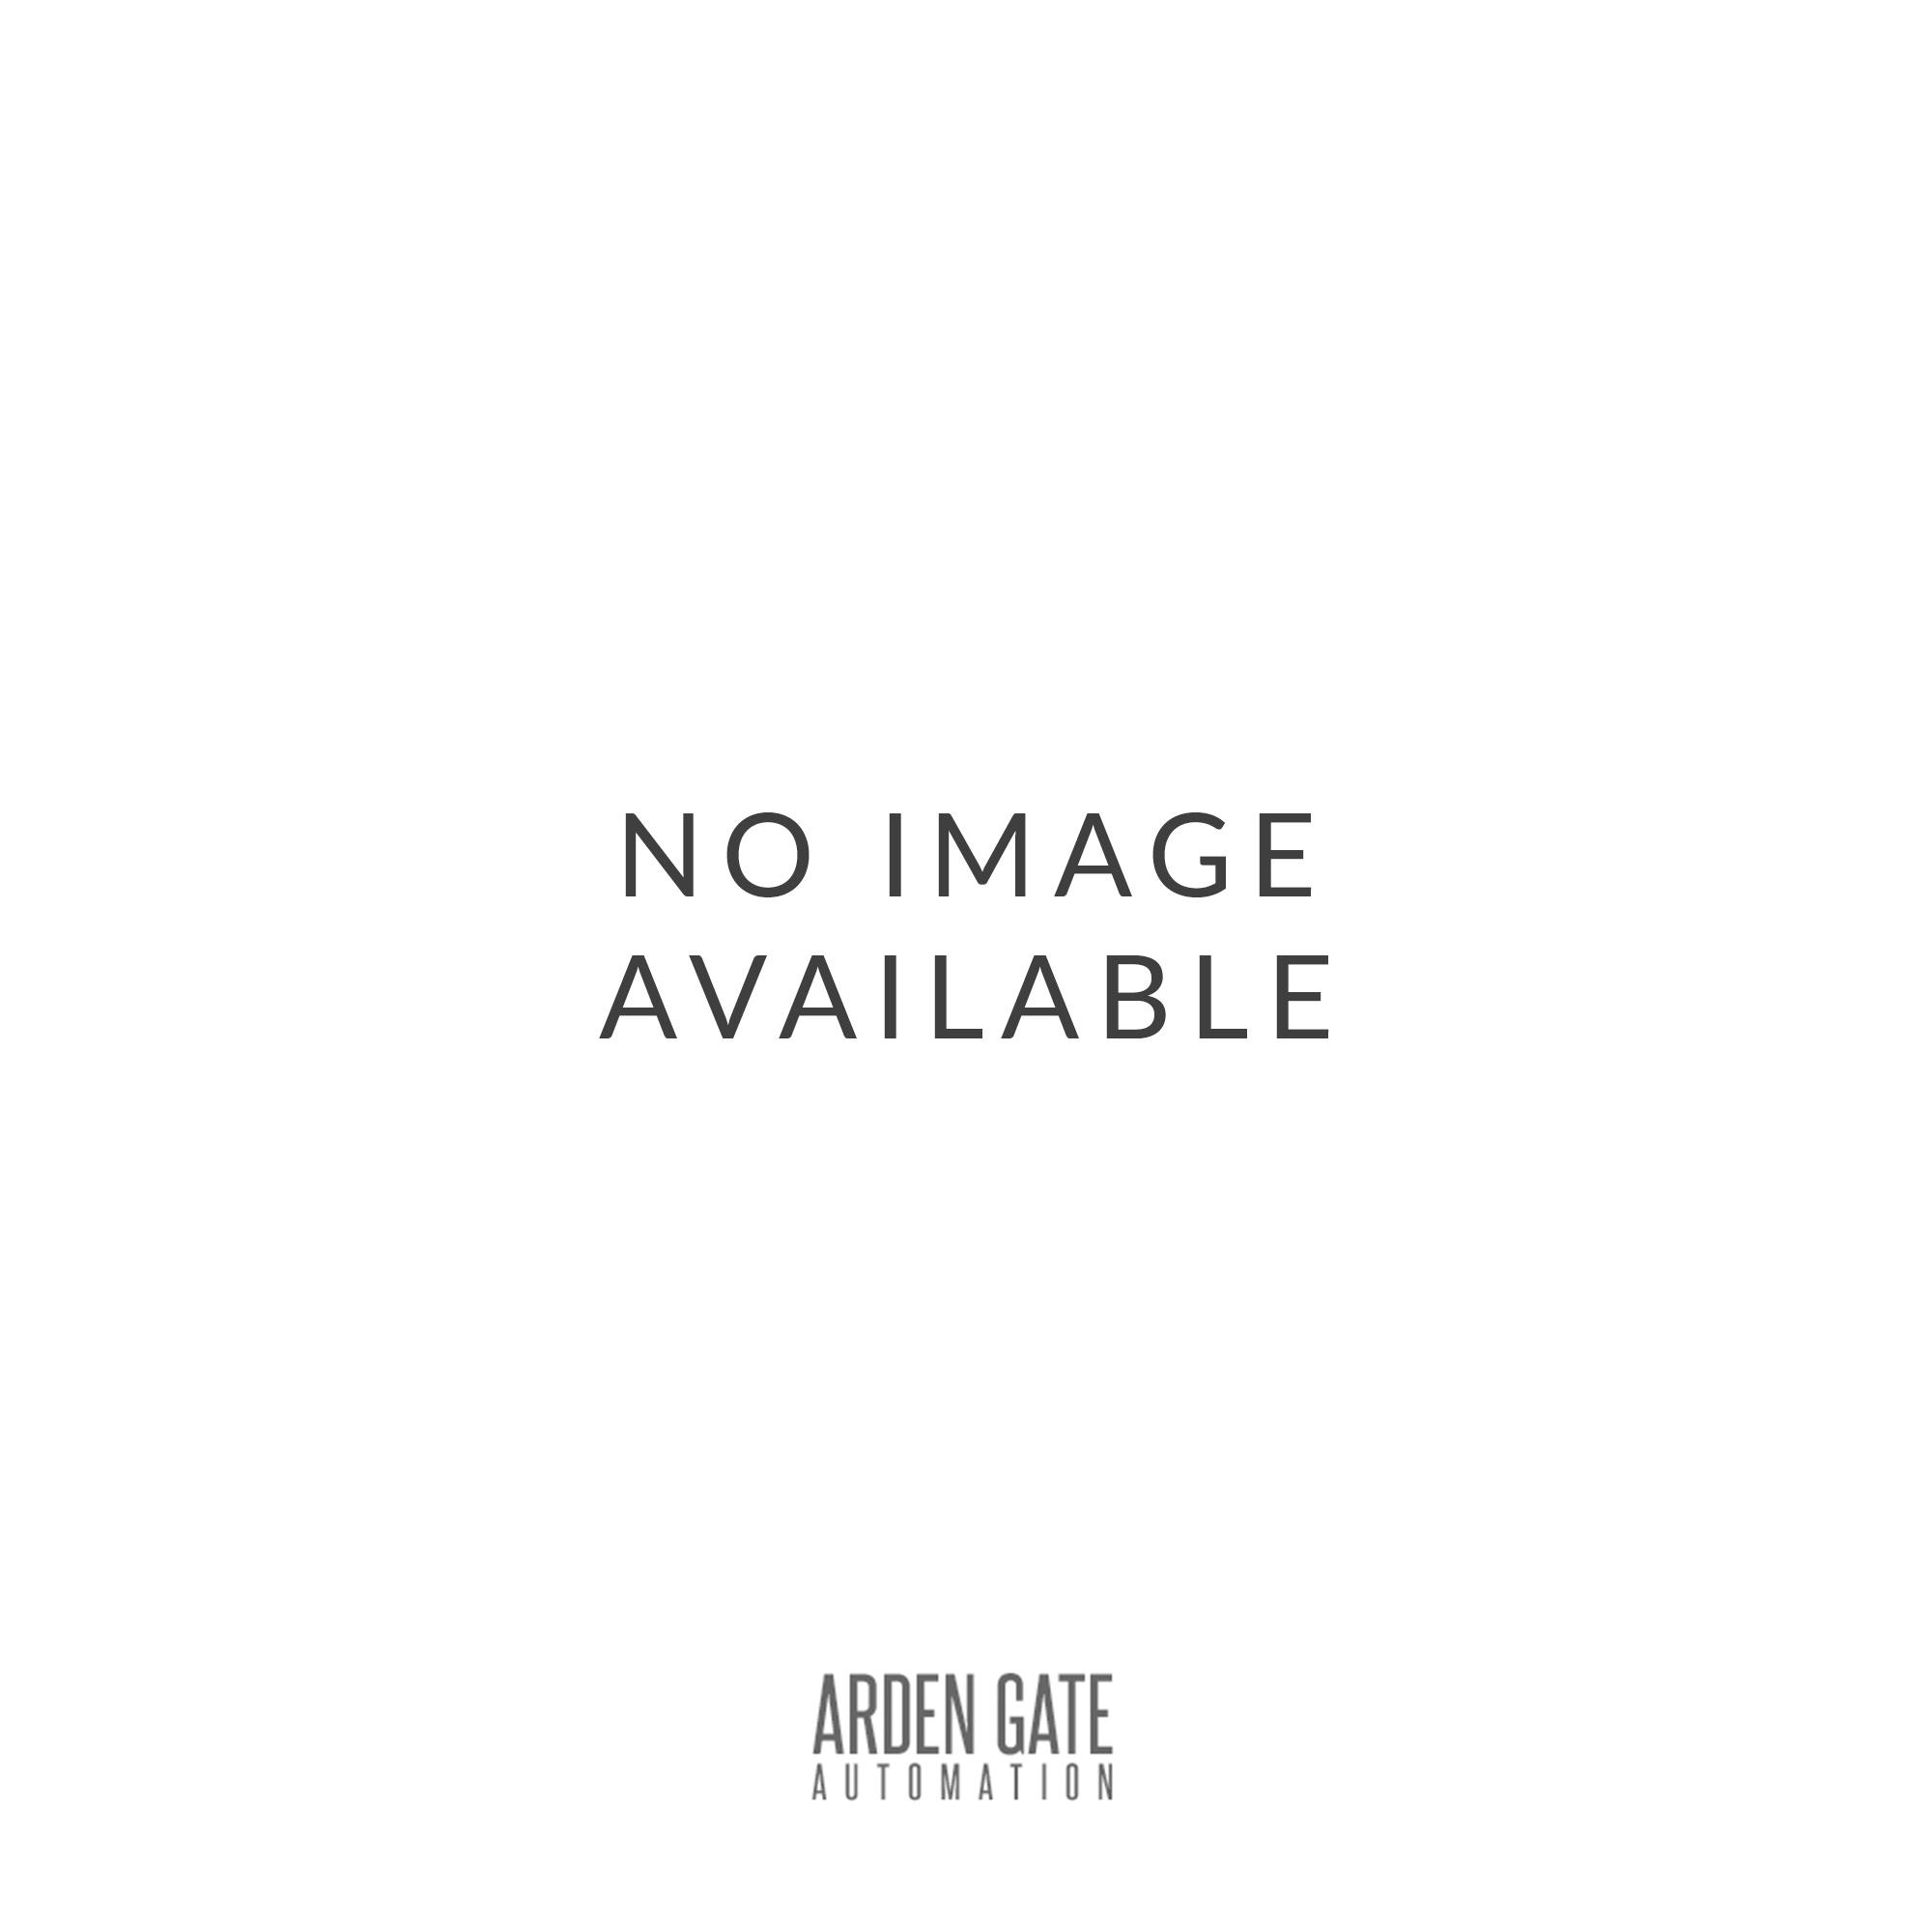 BENINCA KDU.IT24NVE 24v Electro mechanical underground operator pair kit